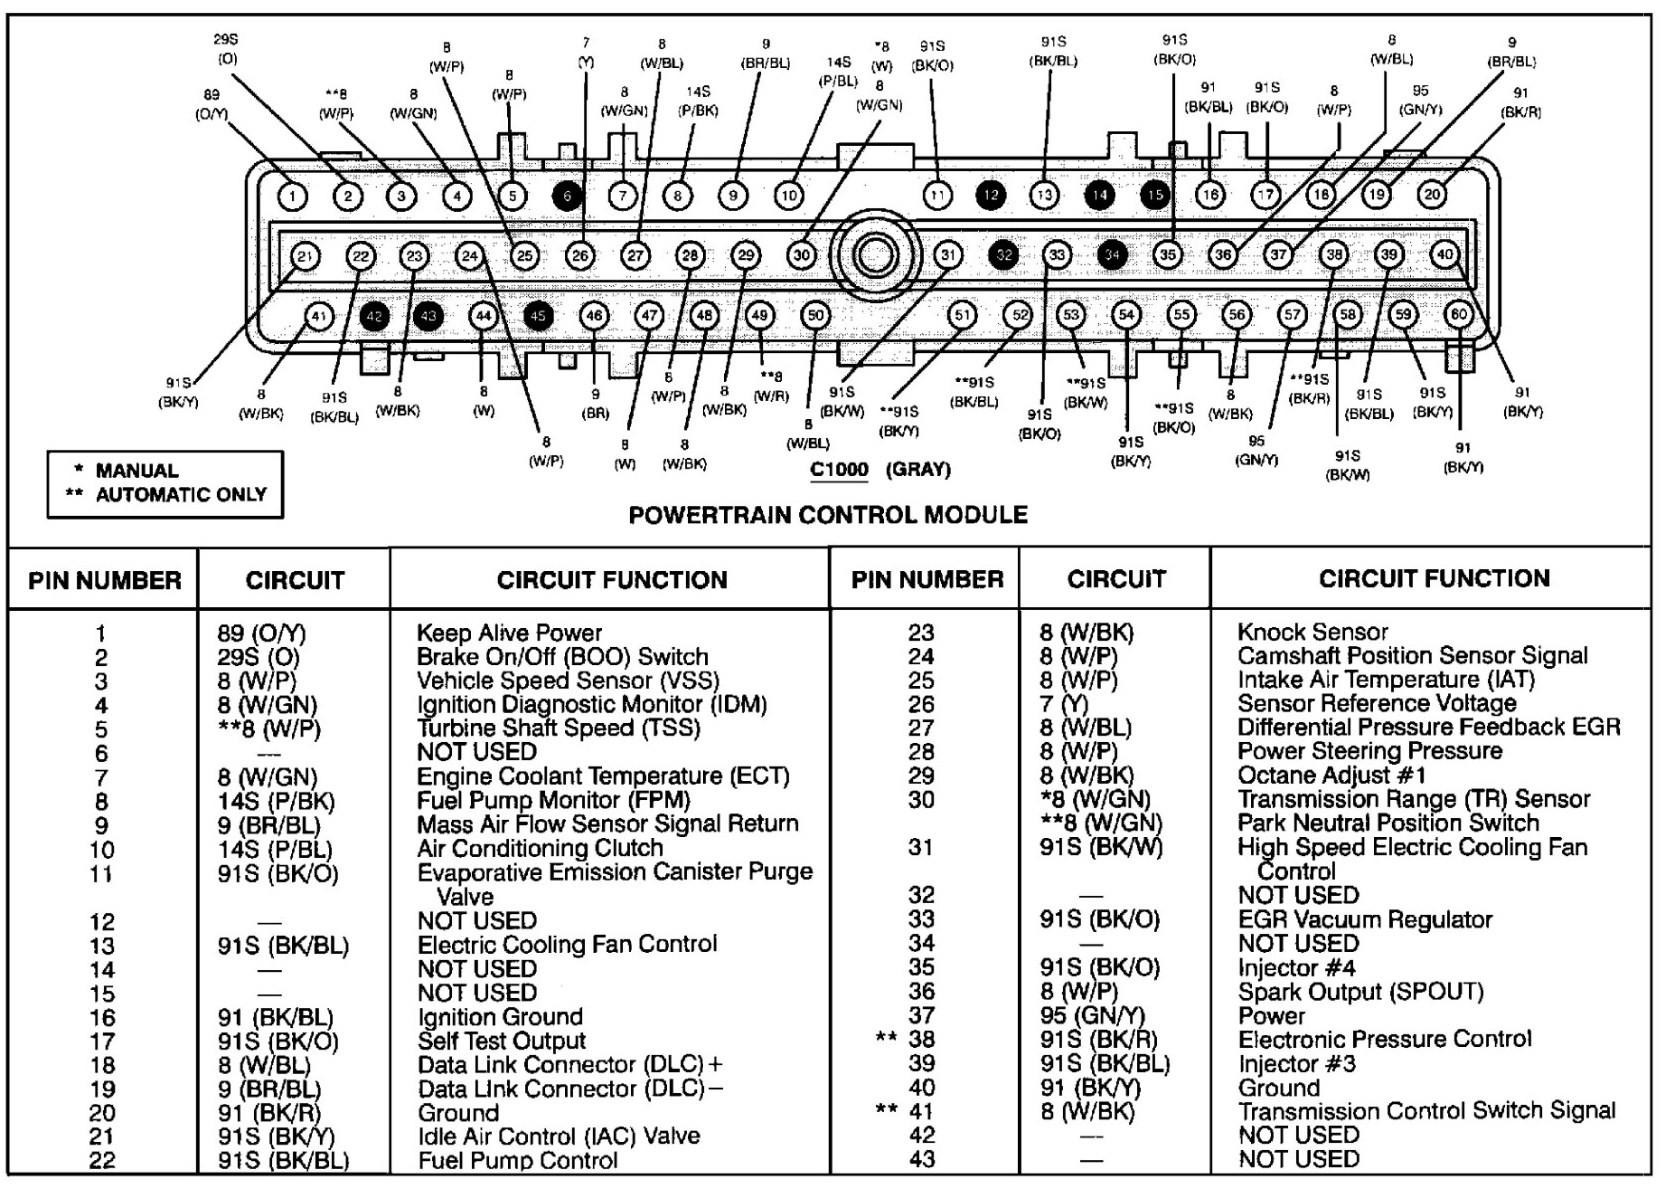 2000 Mercury Grand Marquis Wiring Diagram Car 2000 Mercury Grand Marquis Fuel Pump Wiring Mercury Mystique Of 2000 Mercury Grand Marquis Wiring Diagram